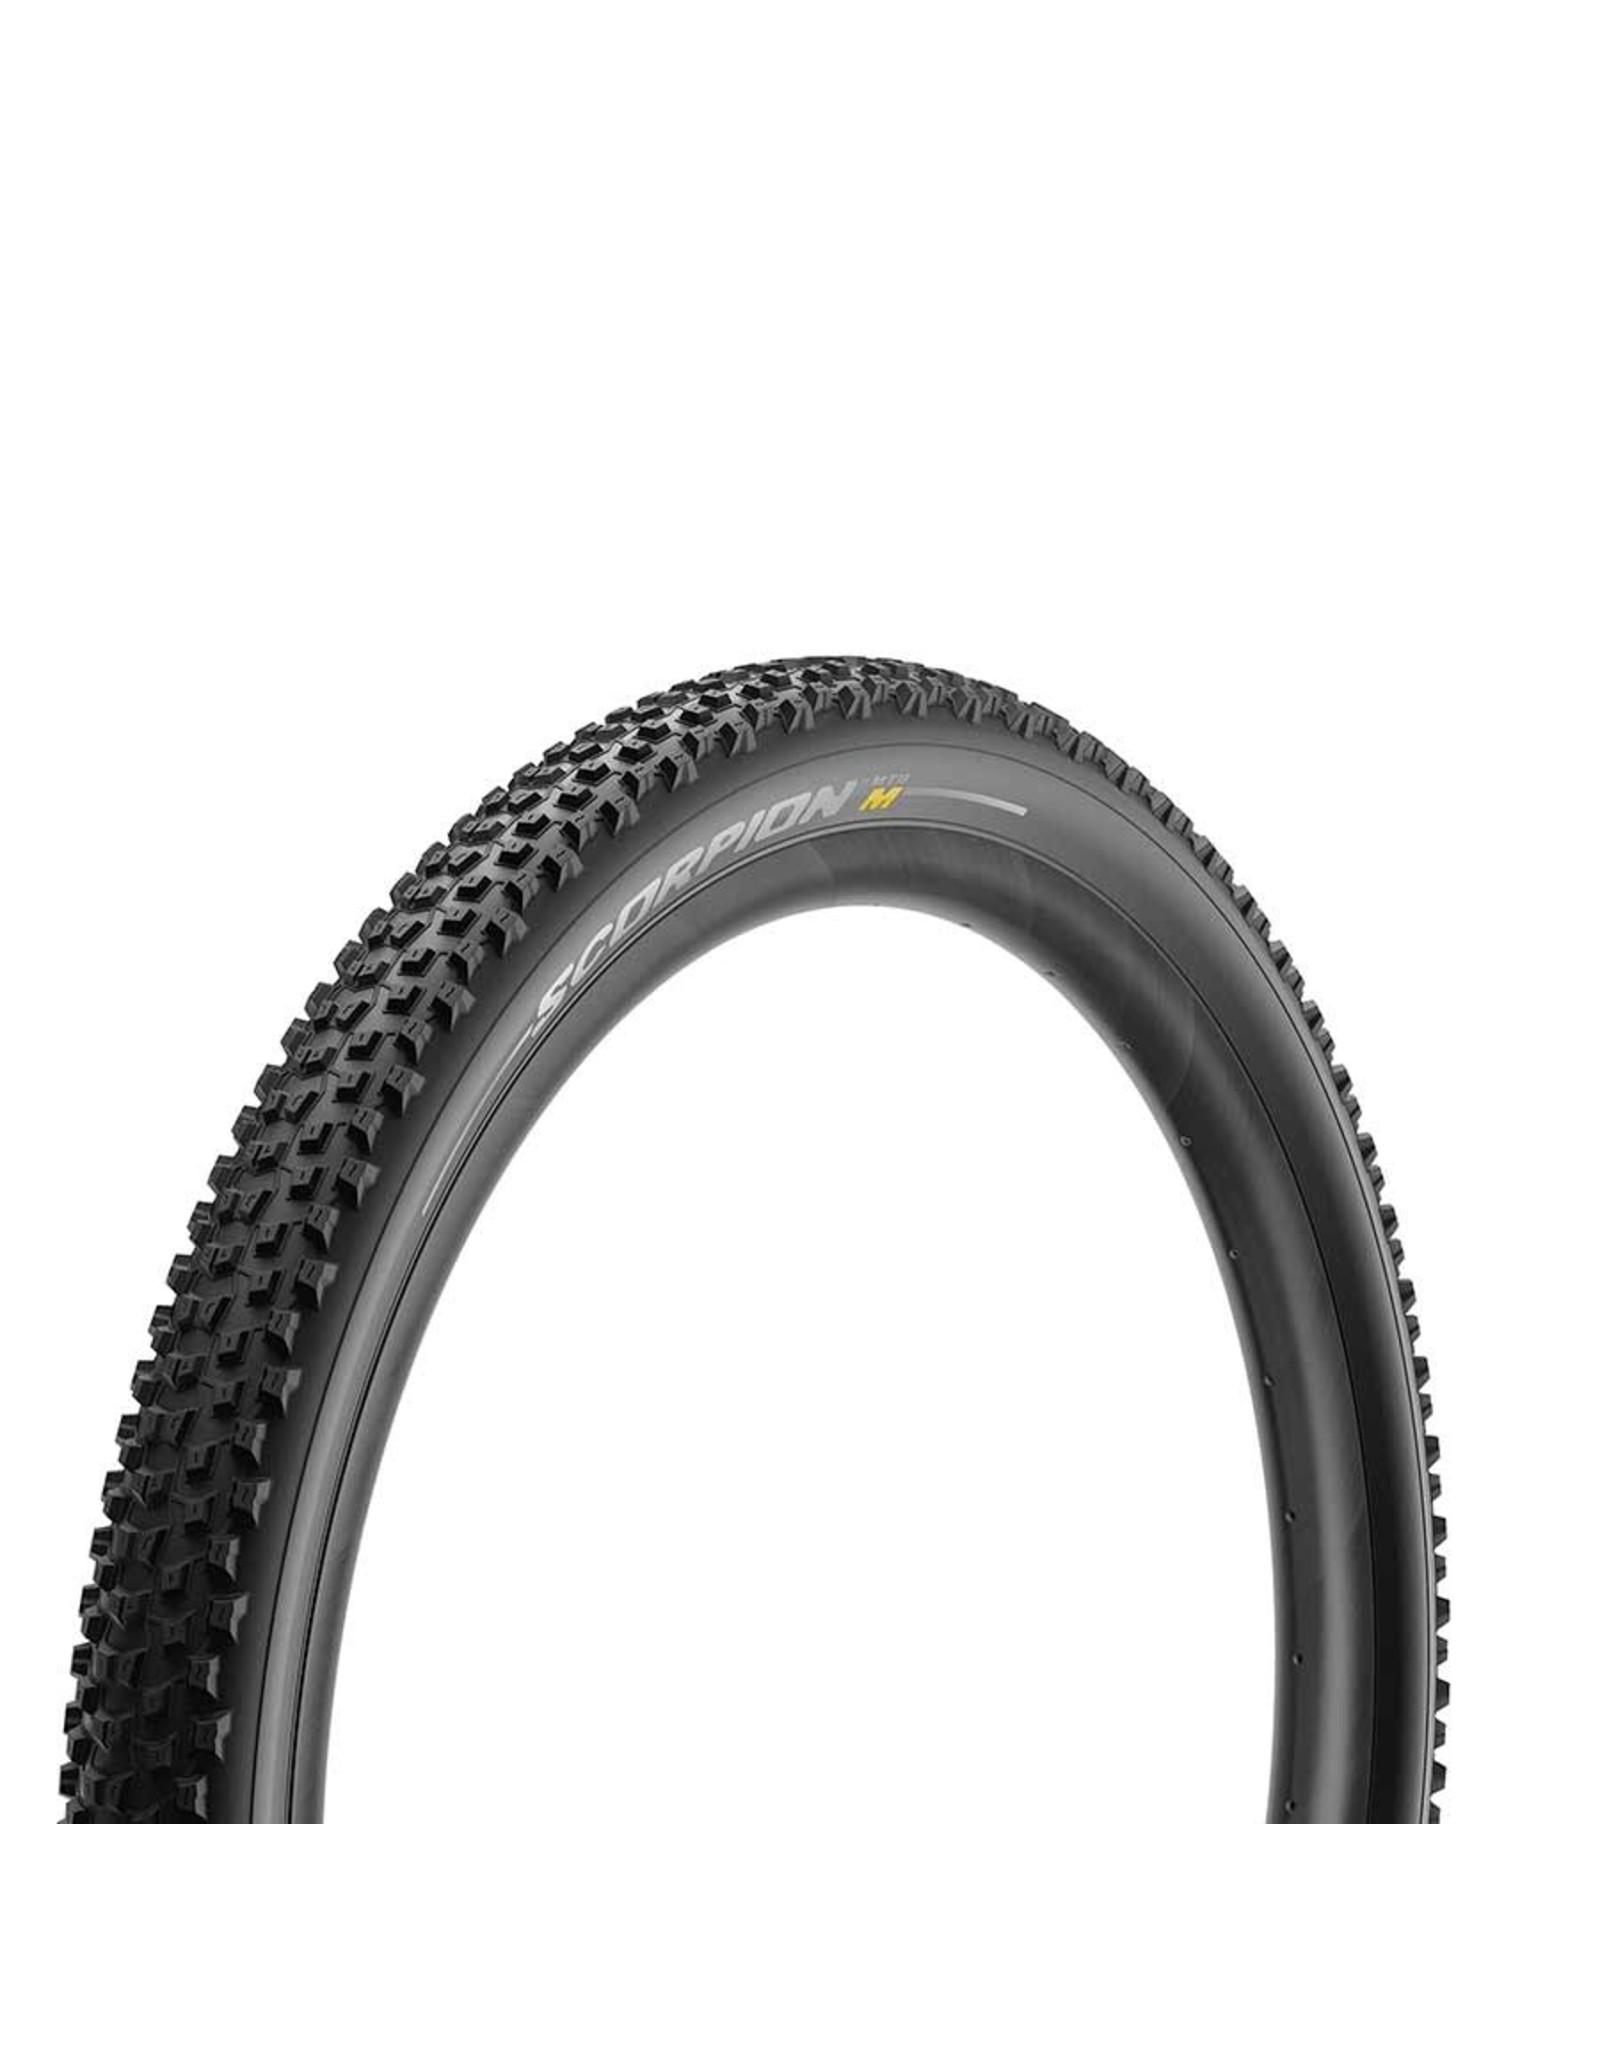 Pirelli Pirelli, Scorpion MTB M, Tire, 29''x2.40, Folding, Tubeless Ready, Smartgrip, 60TPI, Black